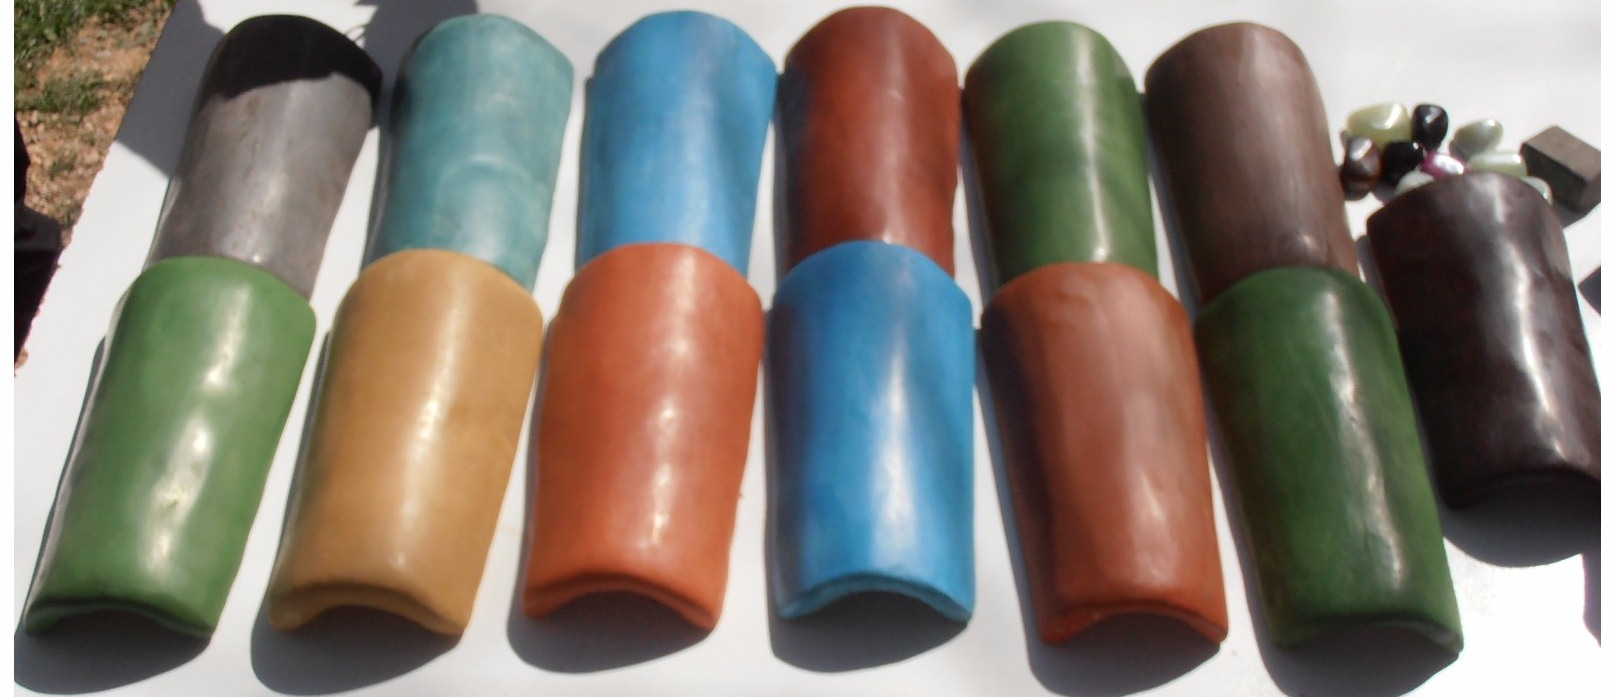 El acabado único de Easy Tadelakt, tejas de tadelakt en diferentes colores